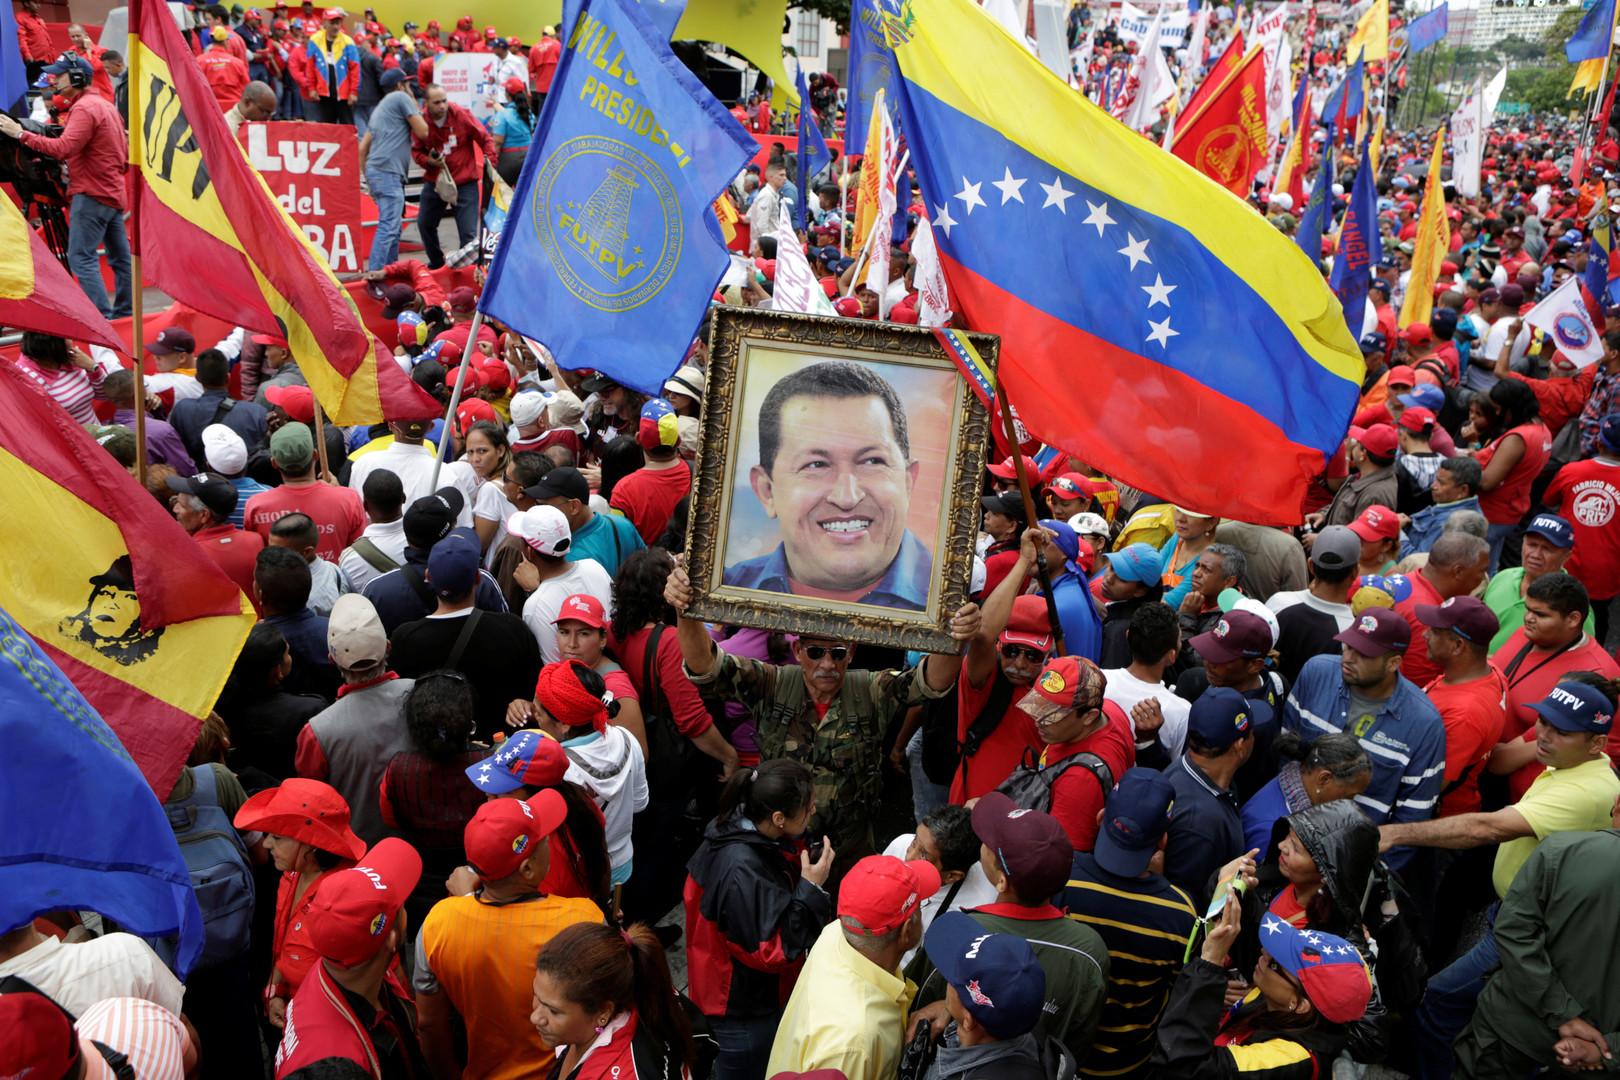 Anhänger des verstorbenen Präsidenten Hugo Chavez in Caracas, Venezuela.